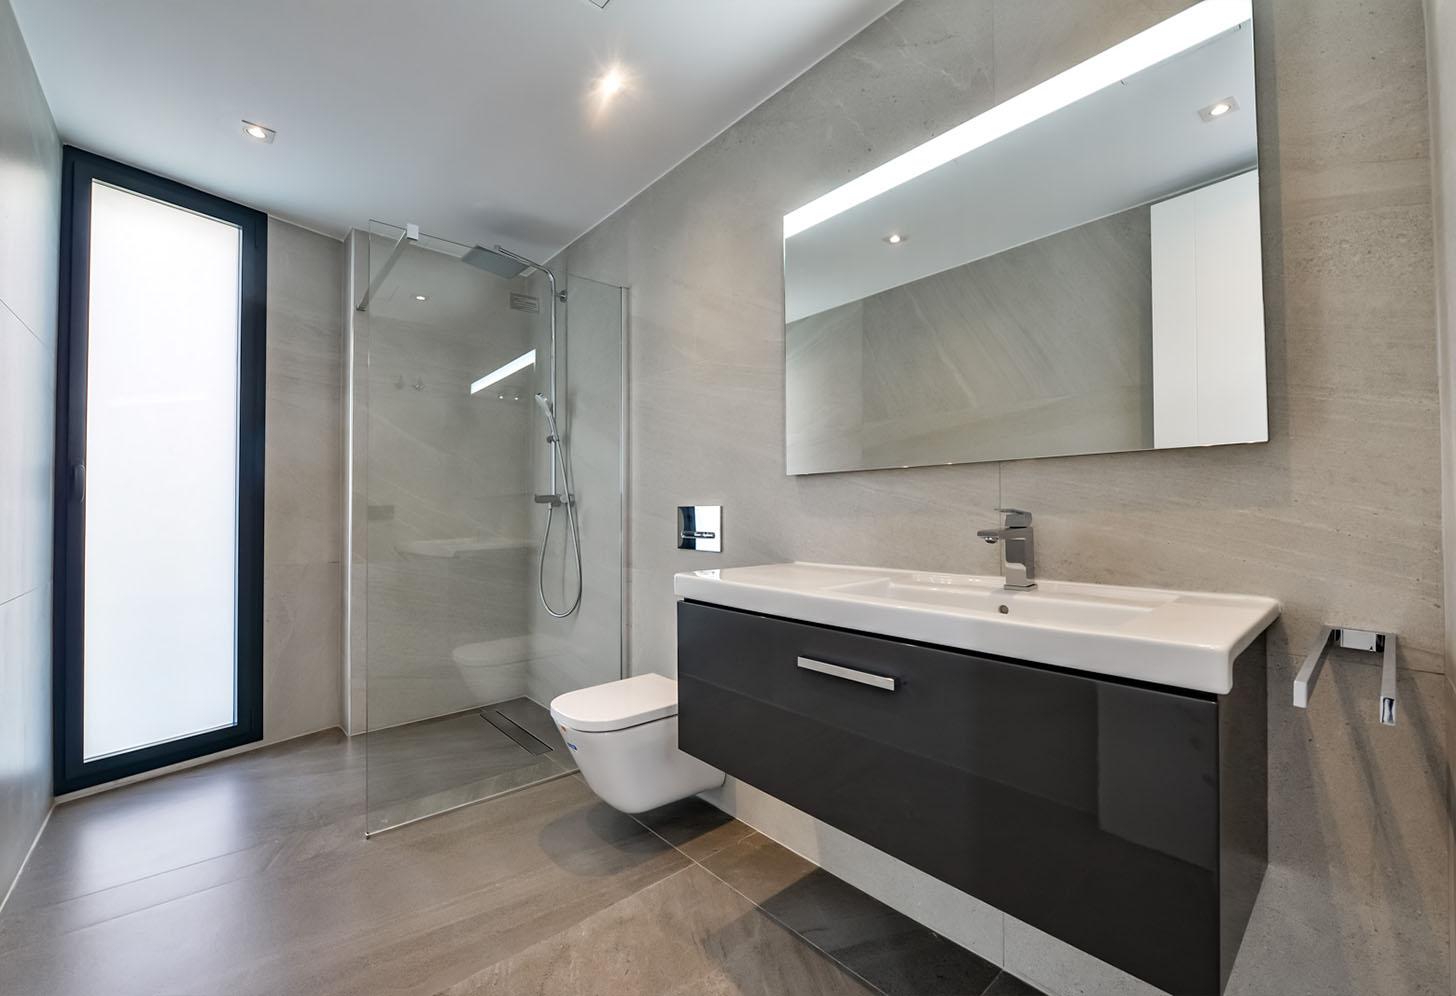 immobilier neuf espagne costa blanca nord on-i1 salle de bain